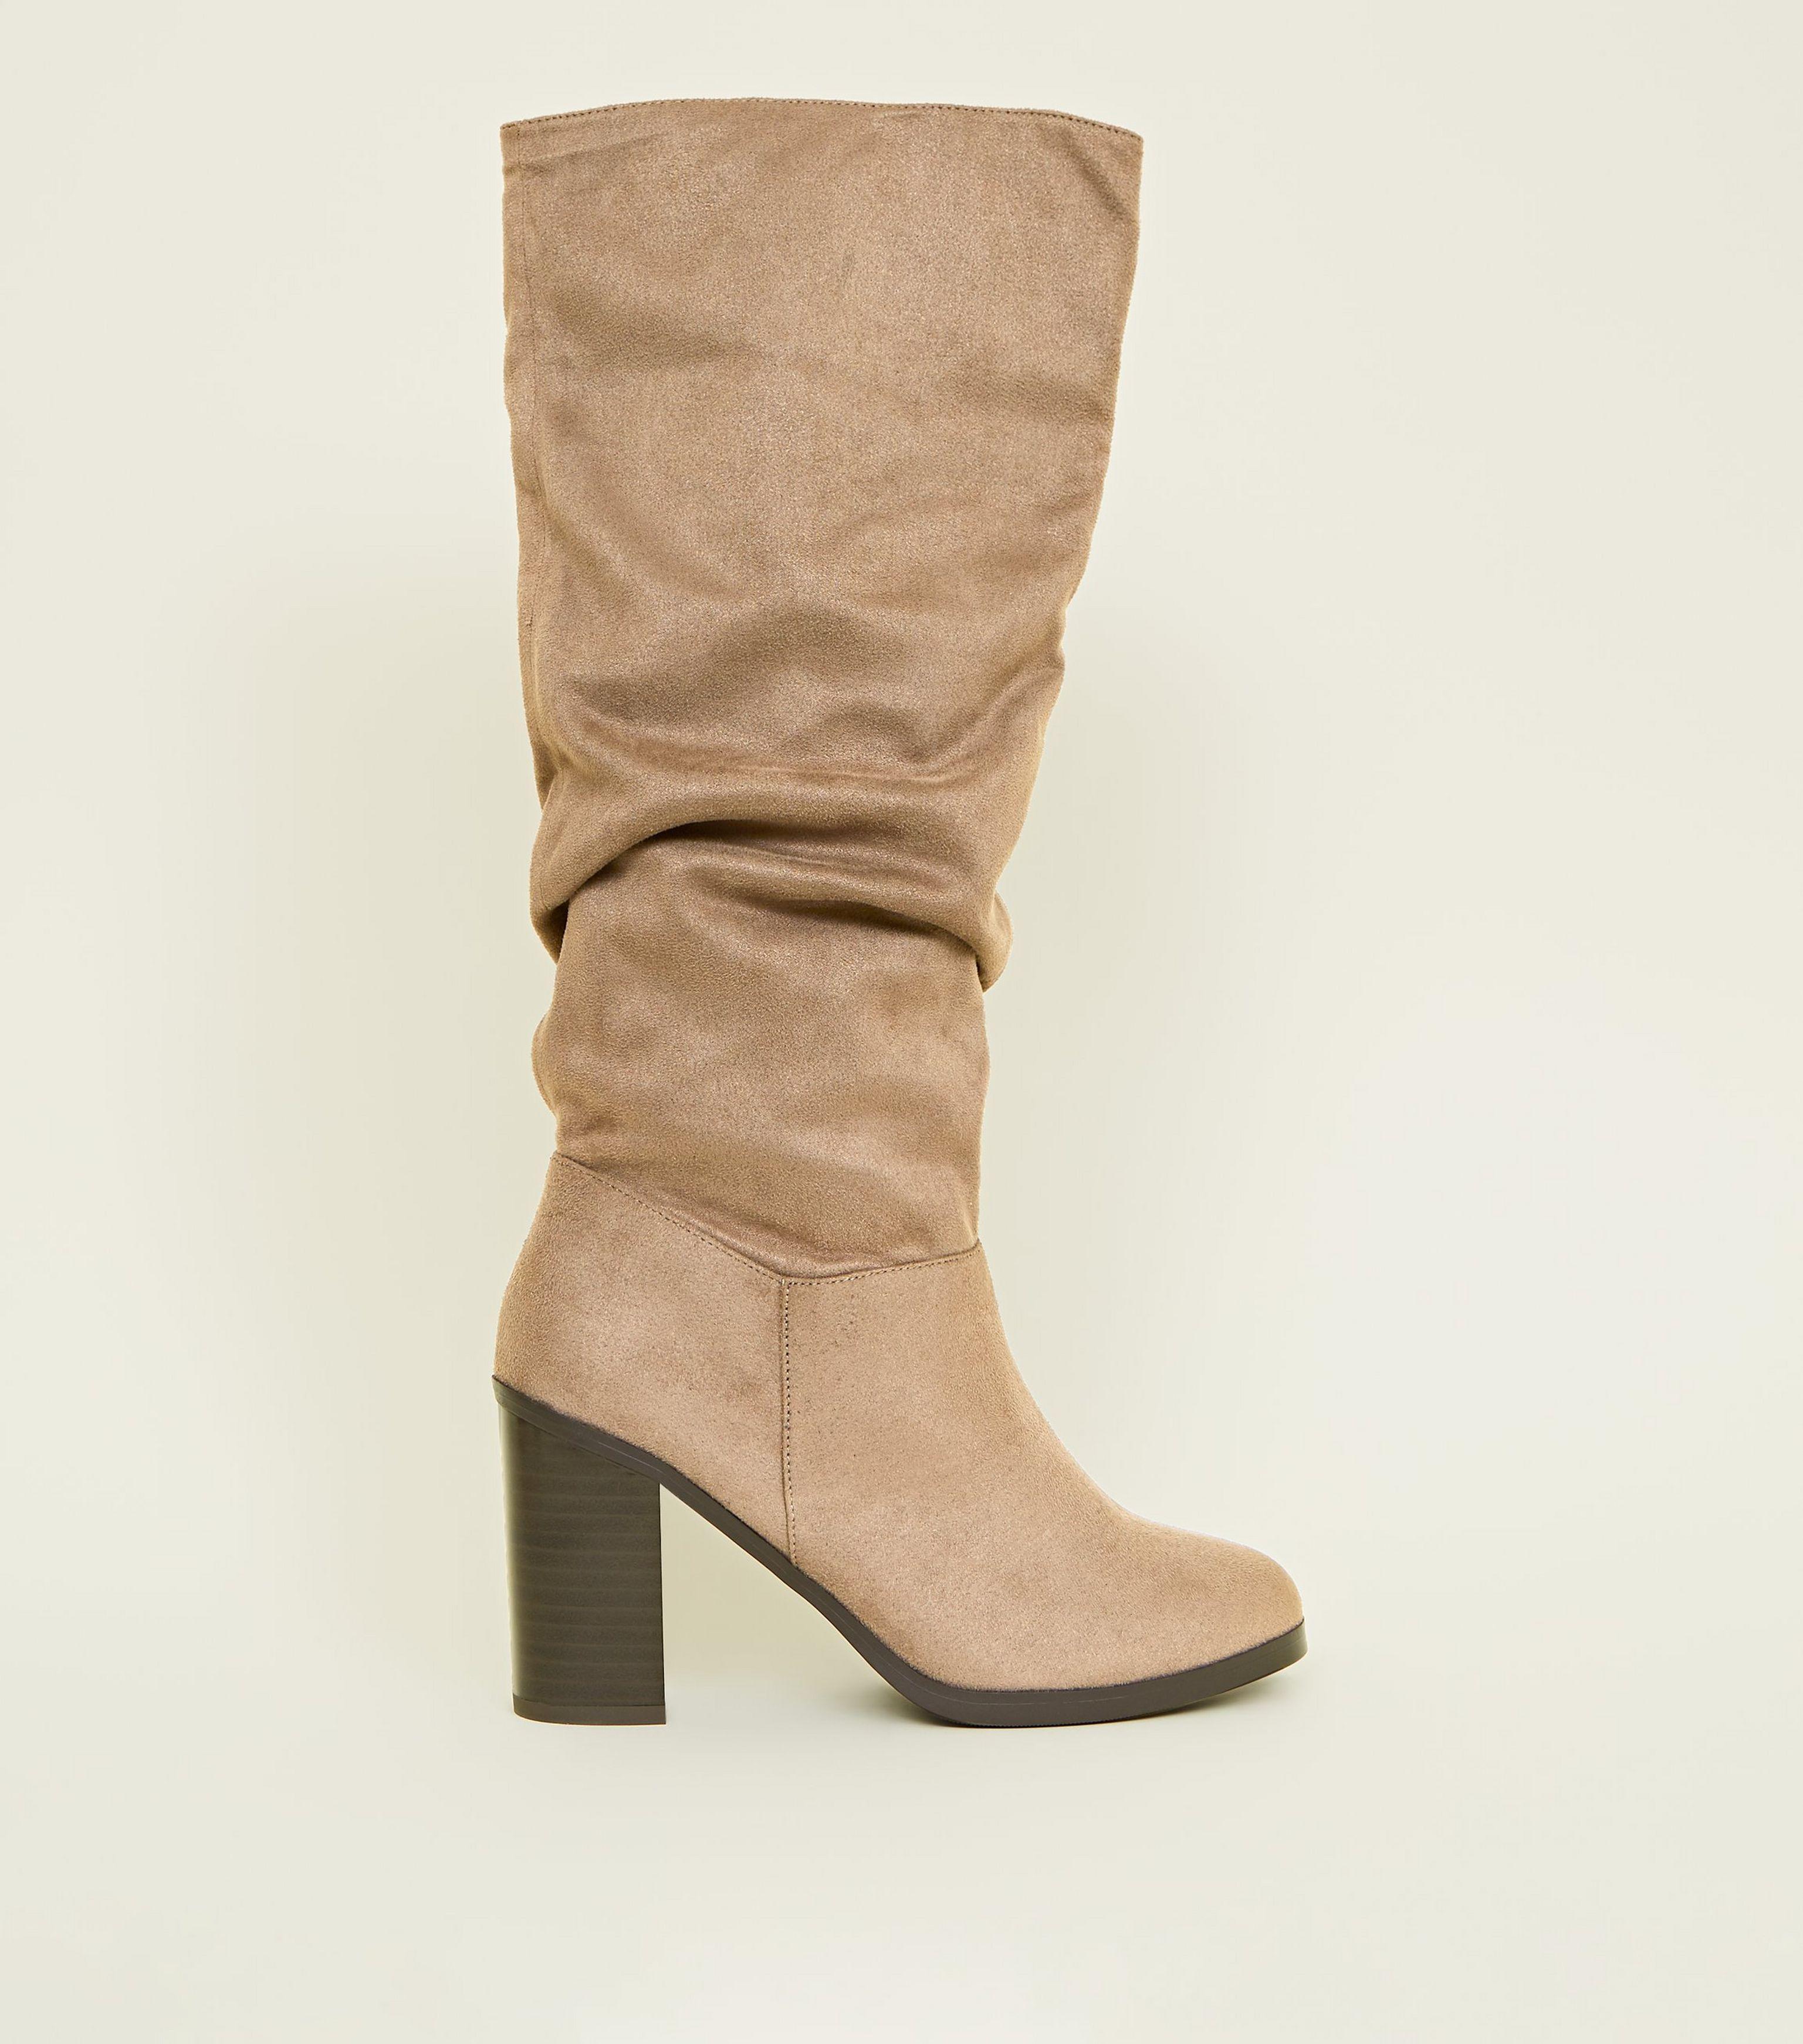 f8db9fd6593 New Look Light Brown Block Heel Knee High Boots in Brown - Lyst